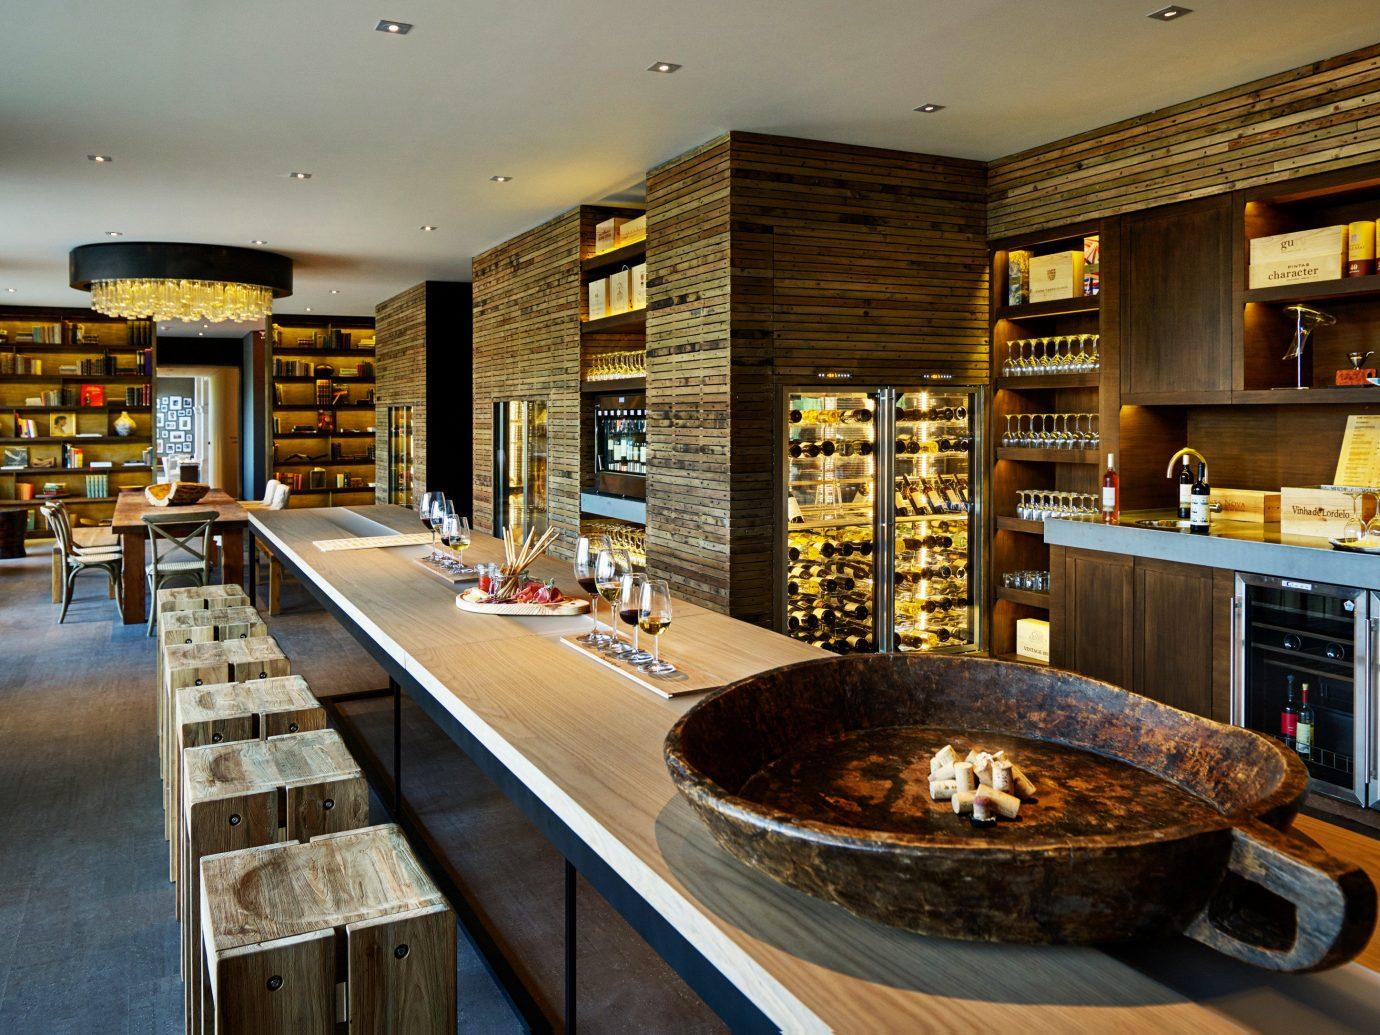 Bar Food + Drink Hotels indoor table Living ceiling building room bakery interior design restaurant estate home meal grocery store retail wood furniture Island